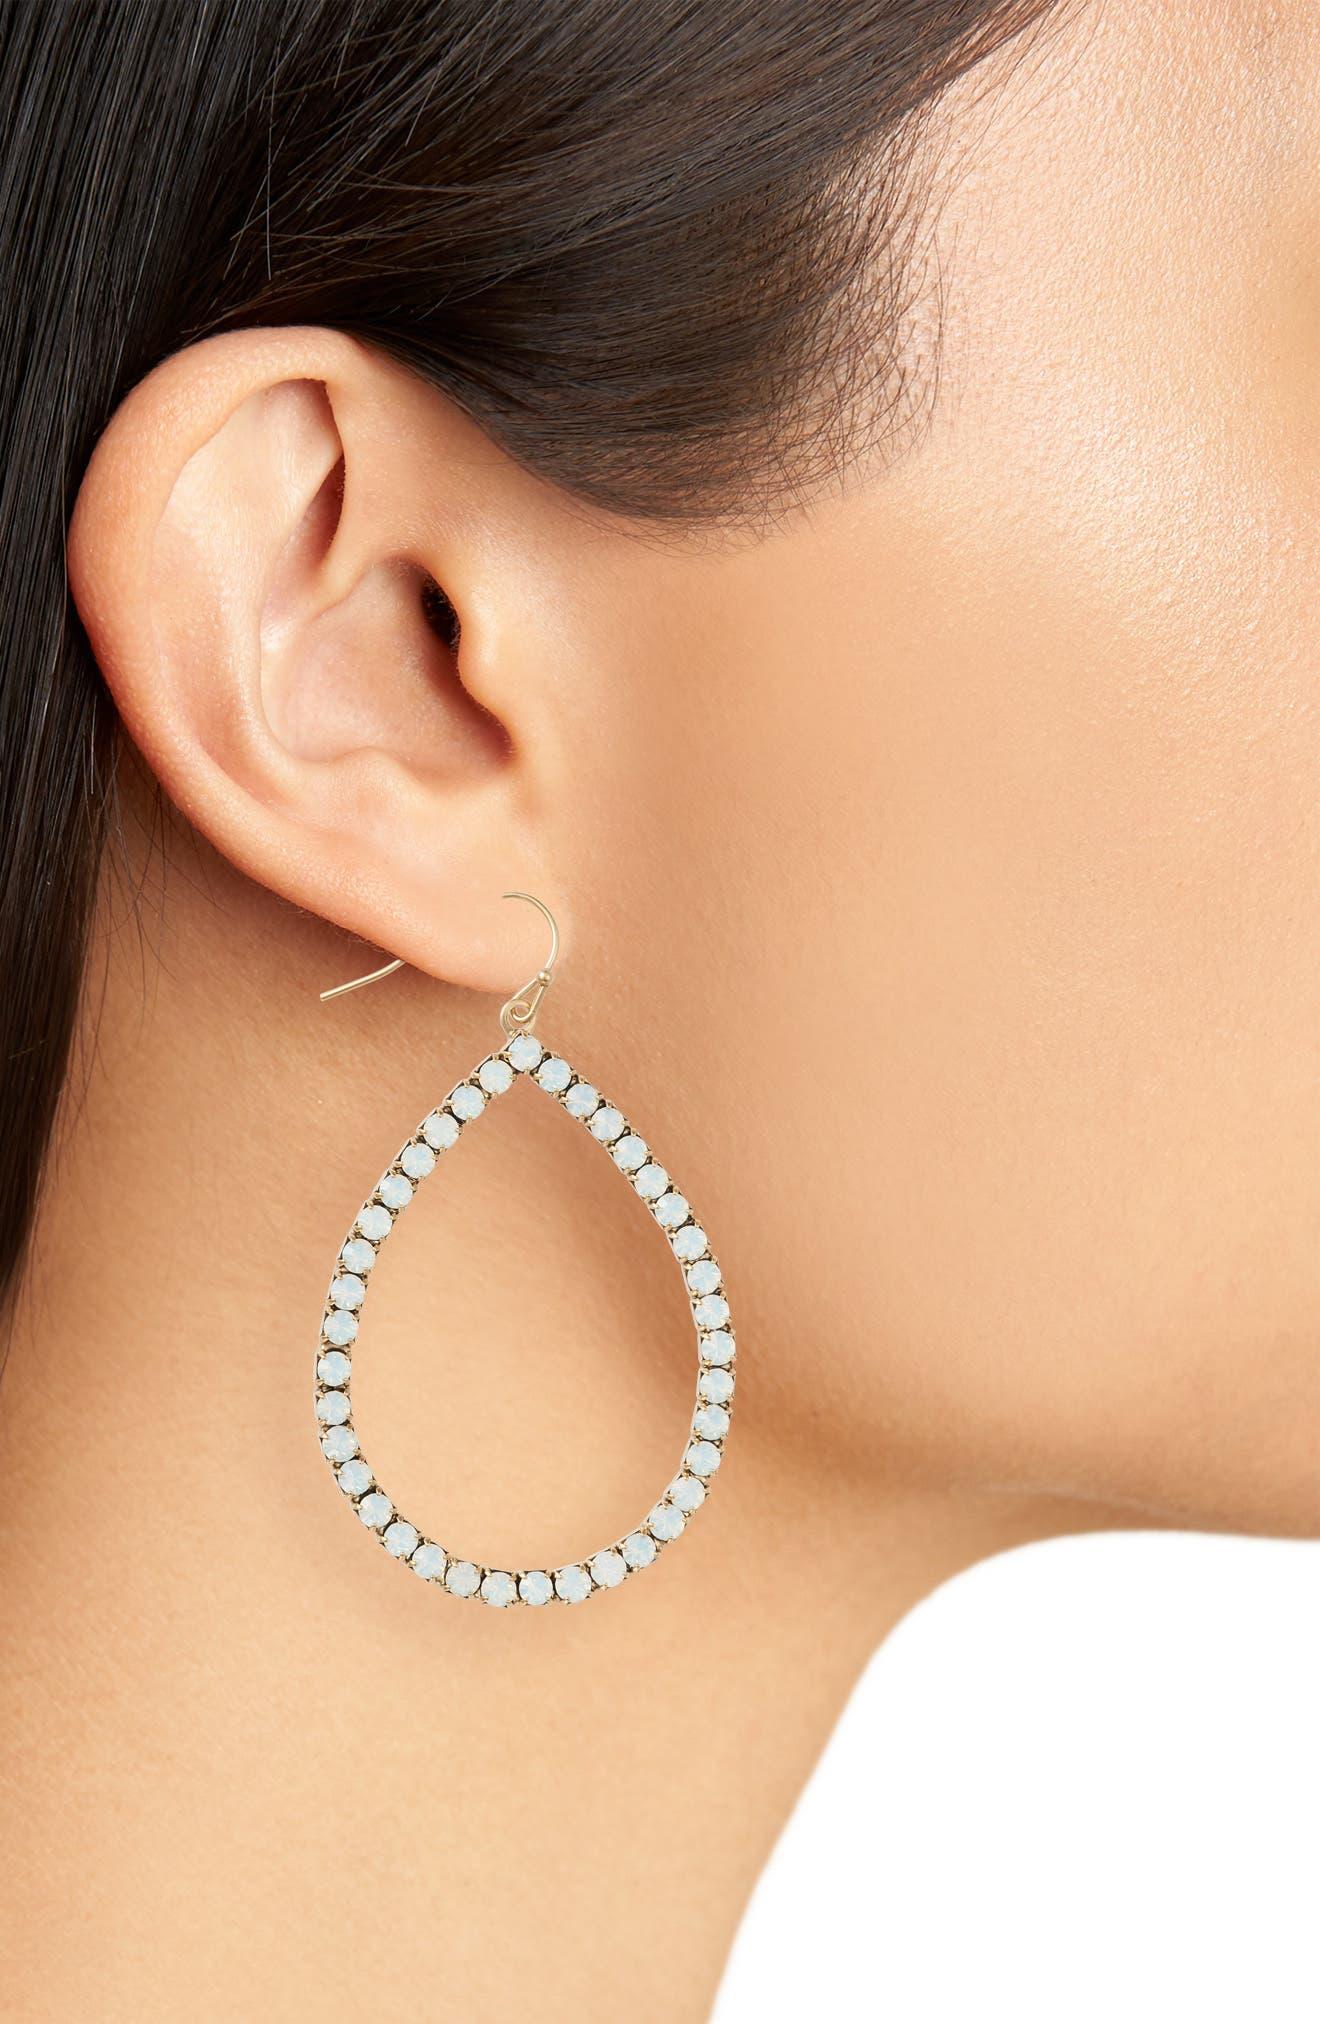 Emilia Crystal Teardrop Earrings,                             Alternate thumbnail 2, color,                             100